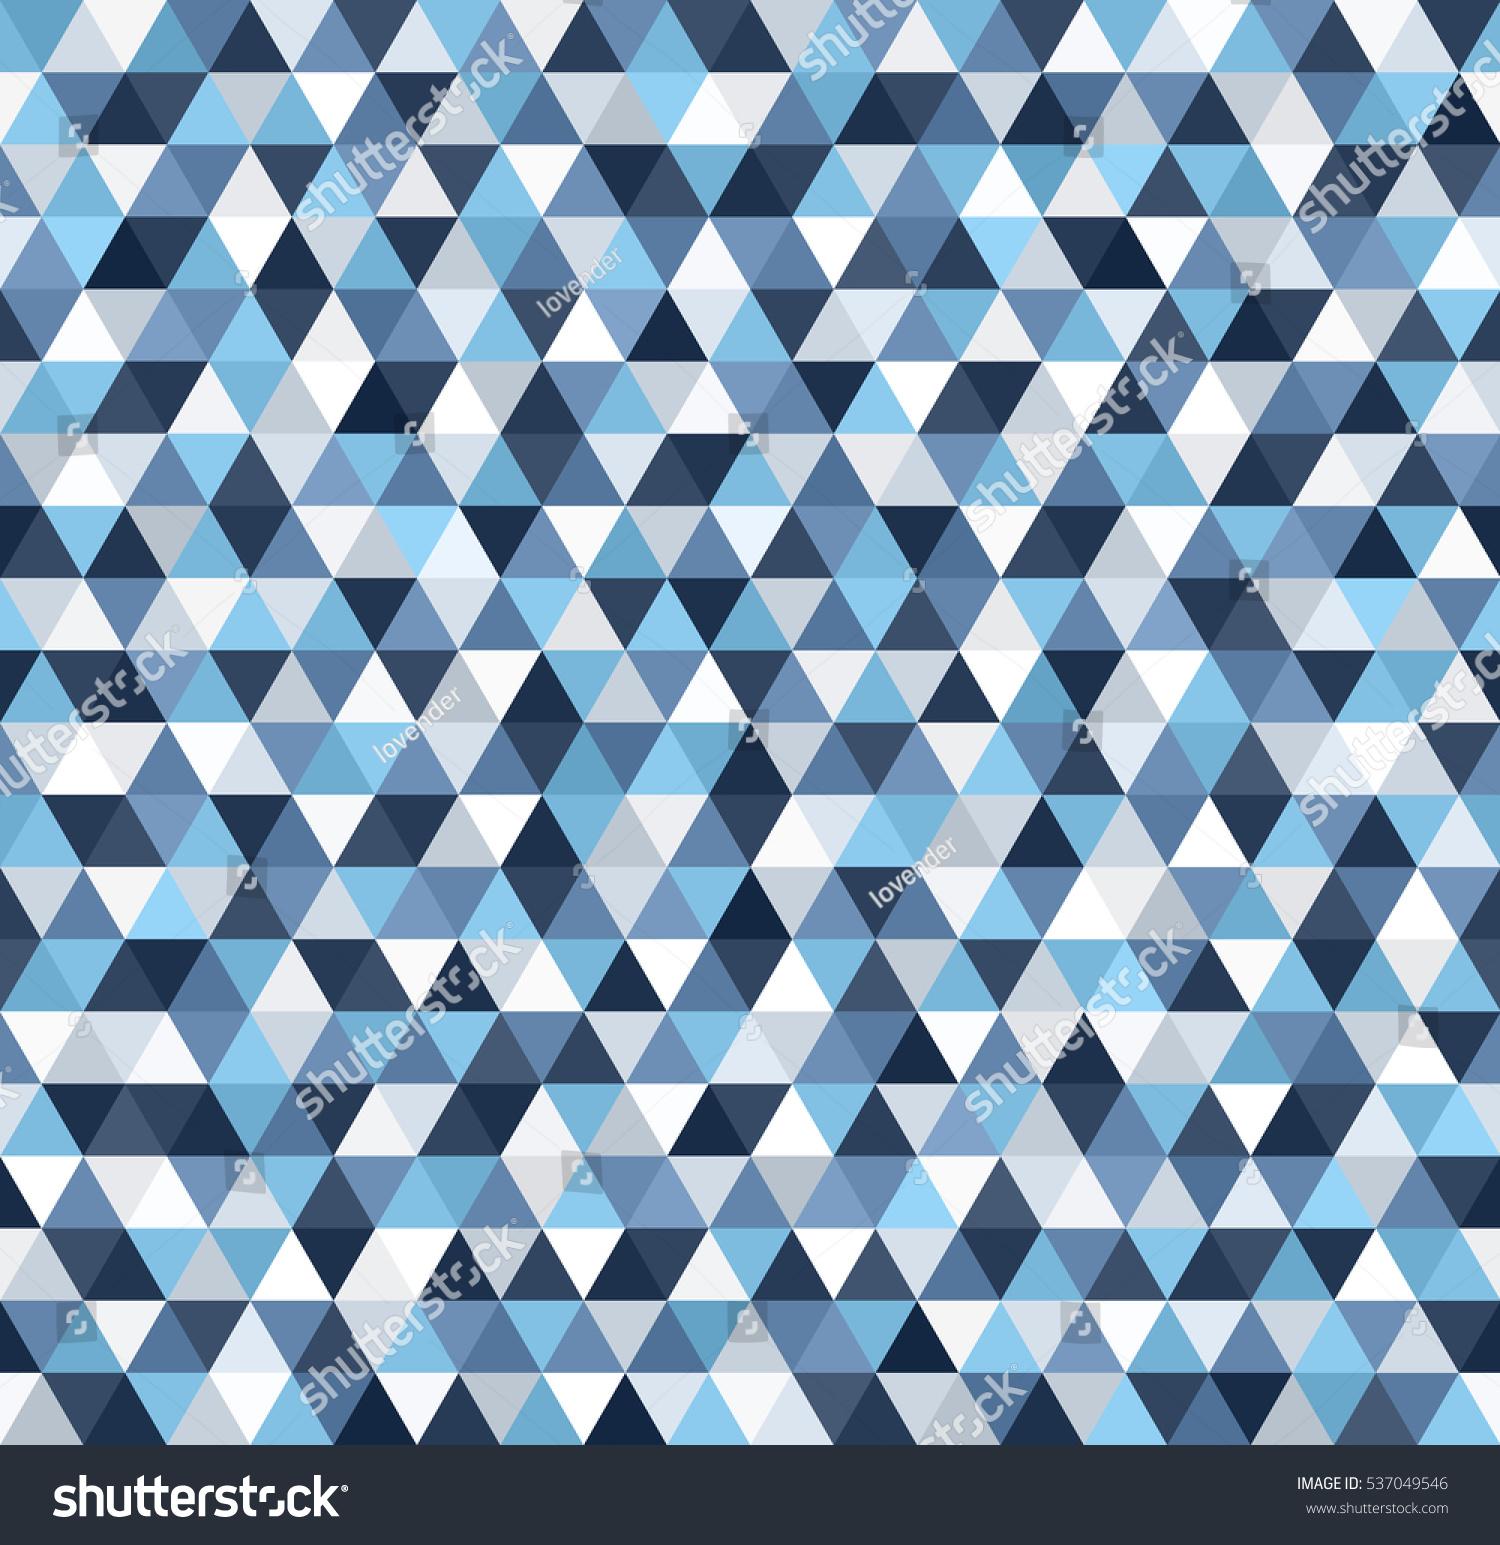 Triangle Pattern New Design Ideas